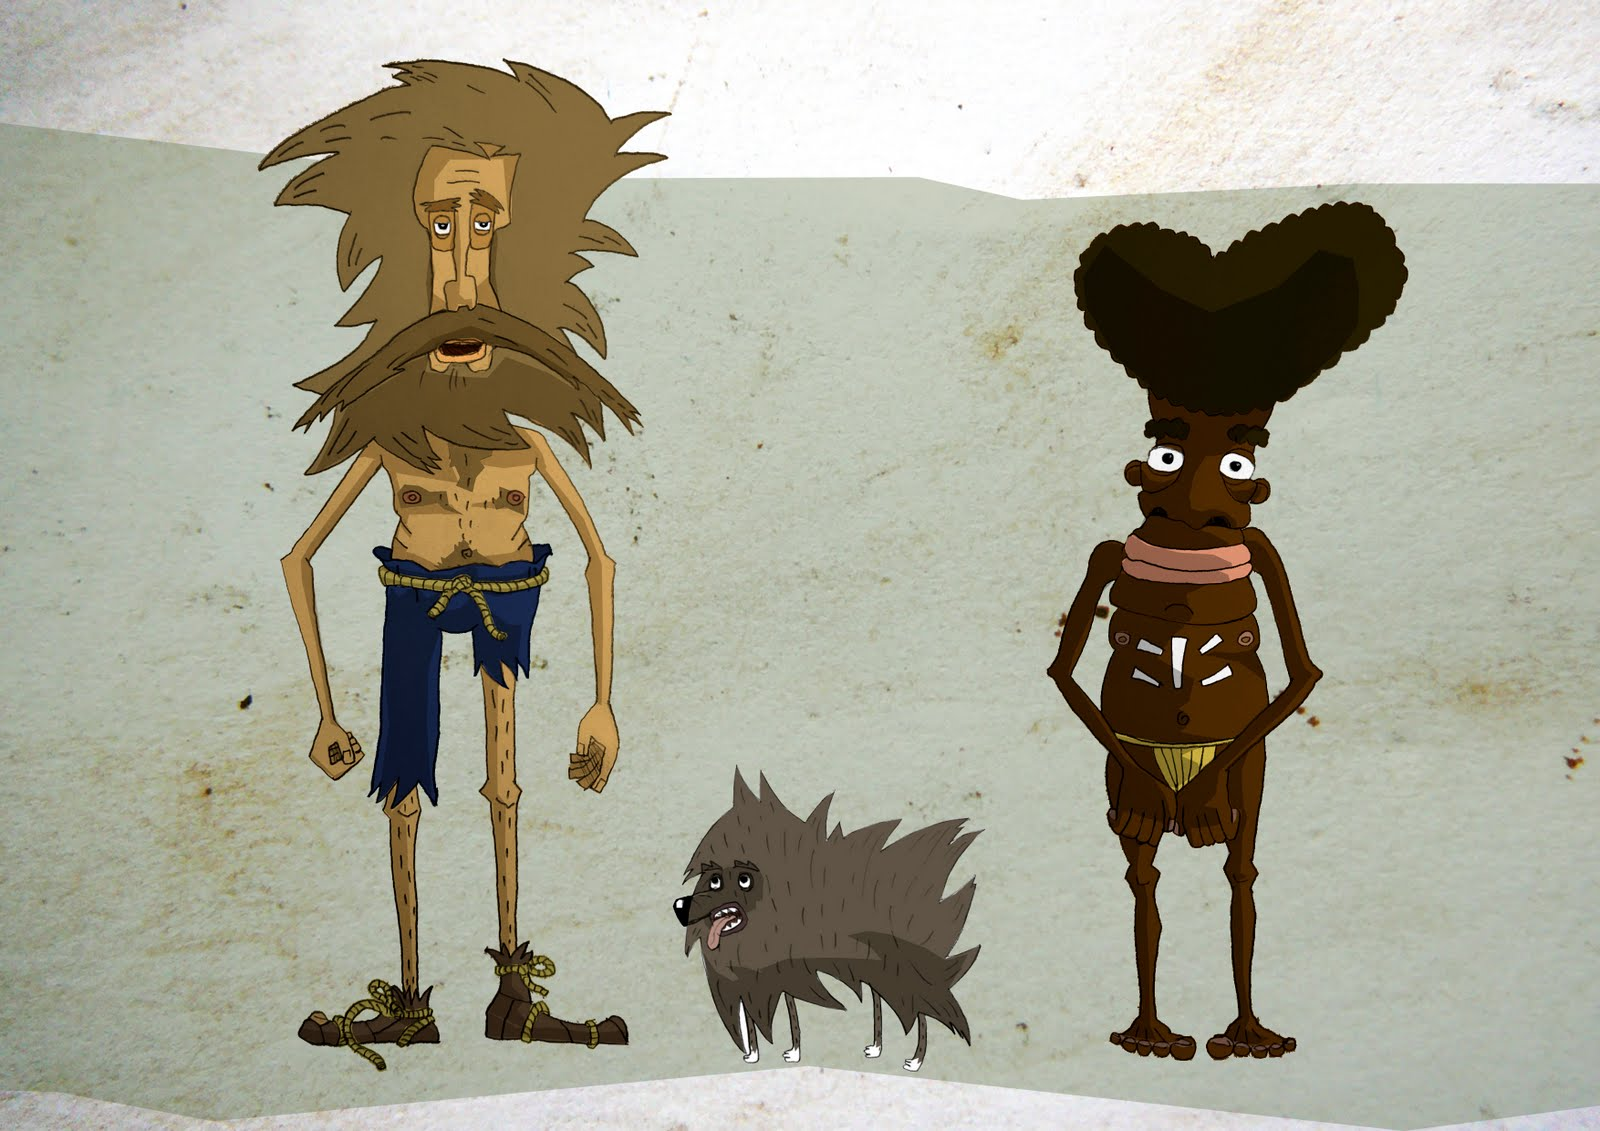 robinson crusoe characters